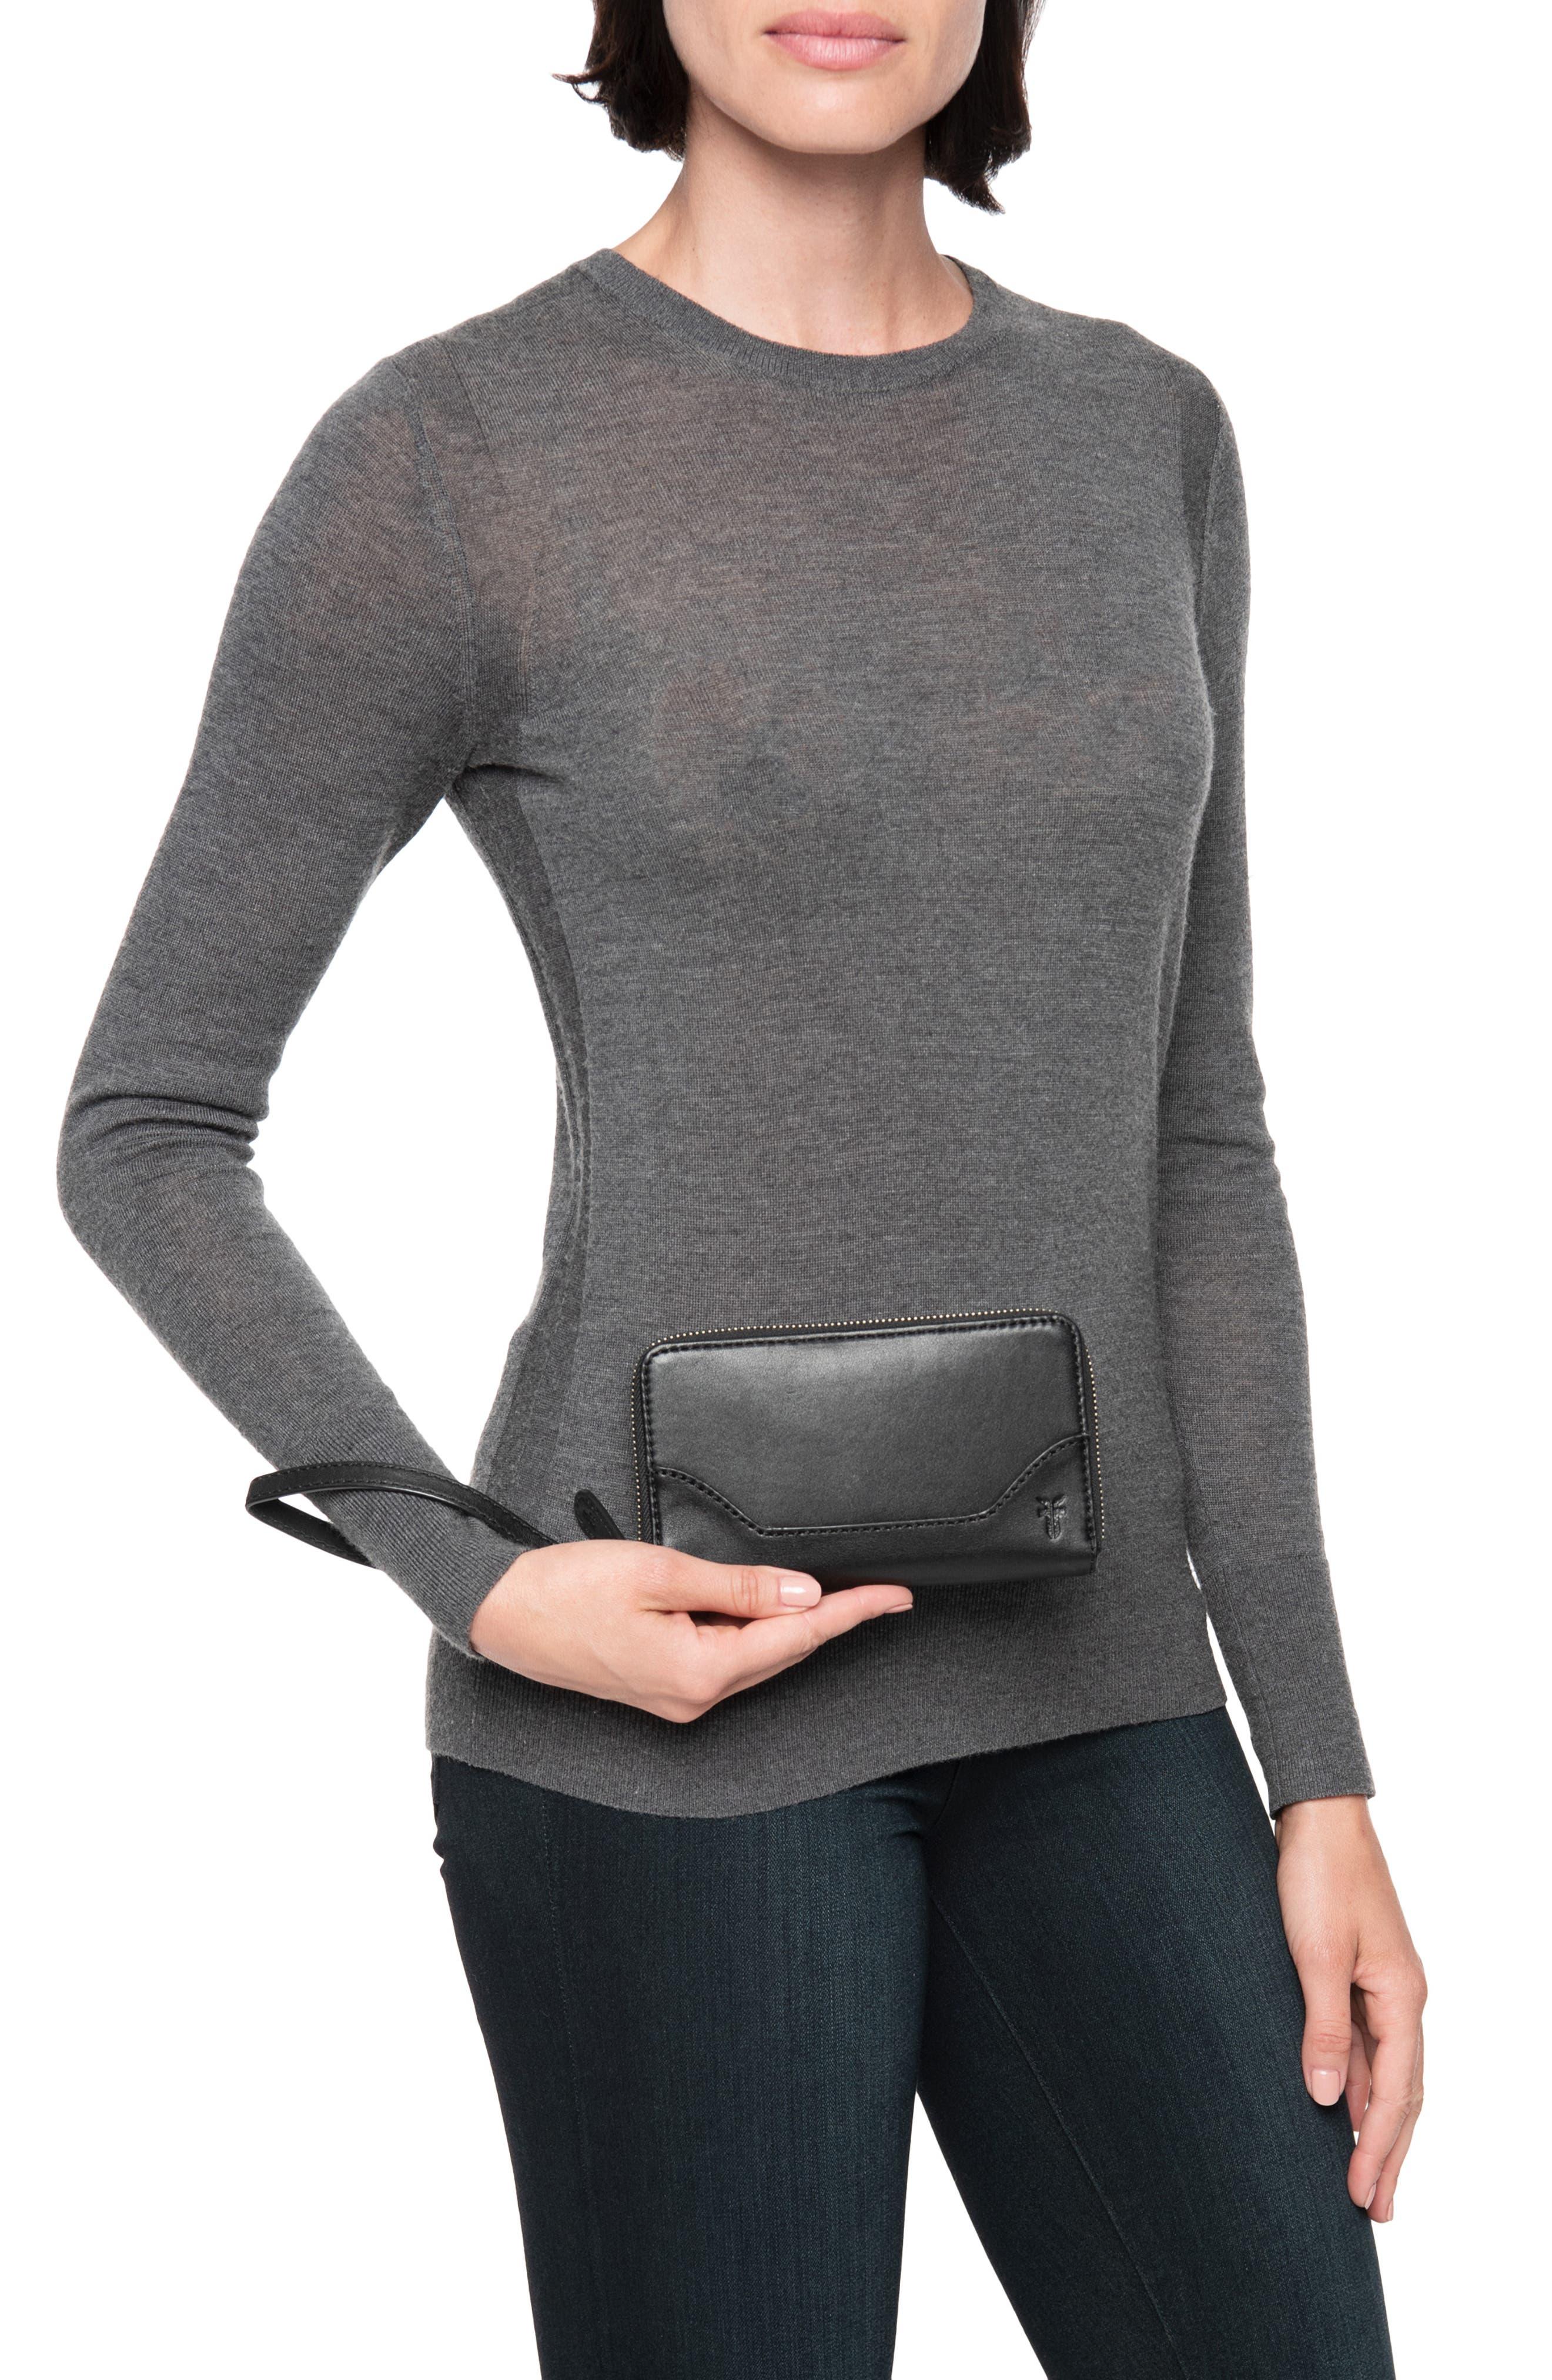 Melissa Leather Phone Wallet,                             Alternate thumbnail 3, color,                             BLACK